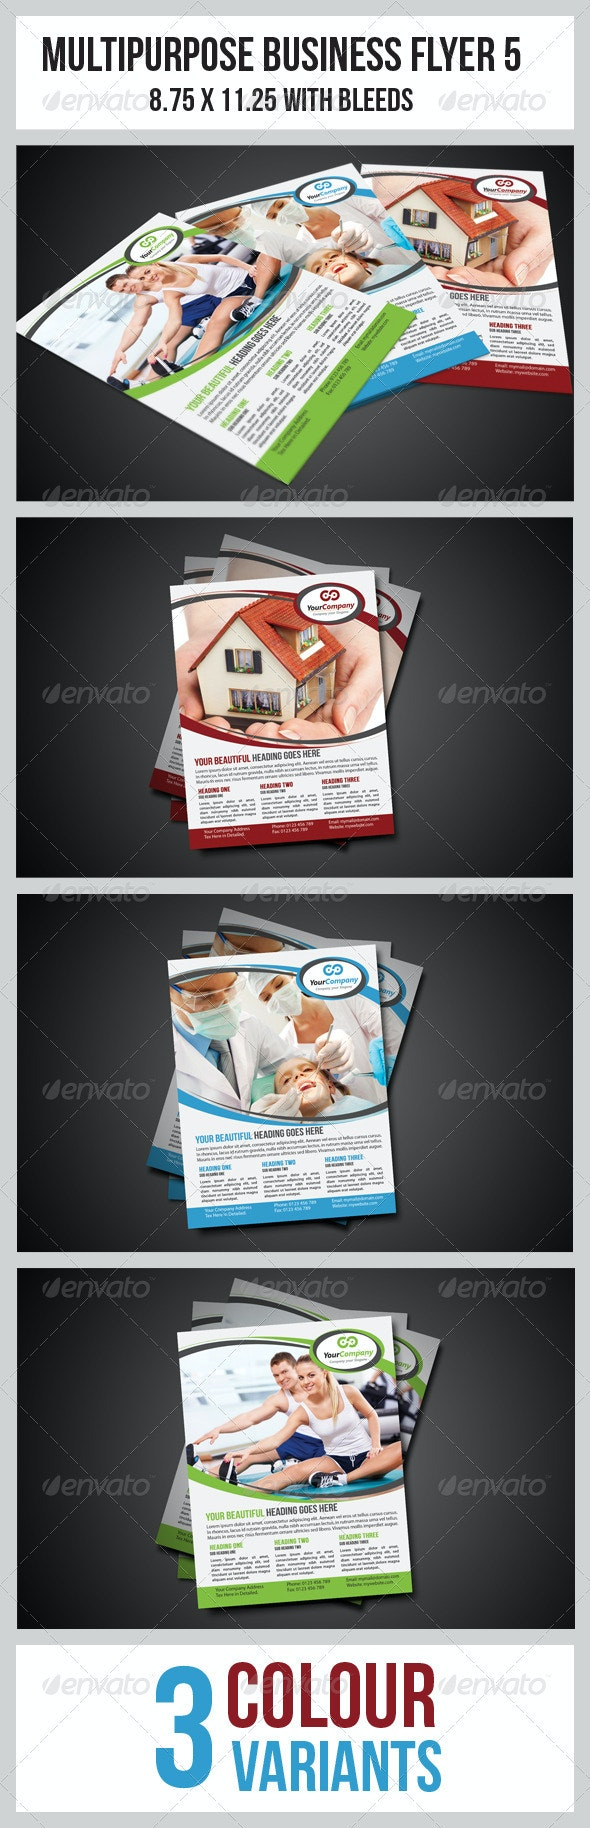 Multipurpose Business Flyer 5 - Corporate Flyers